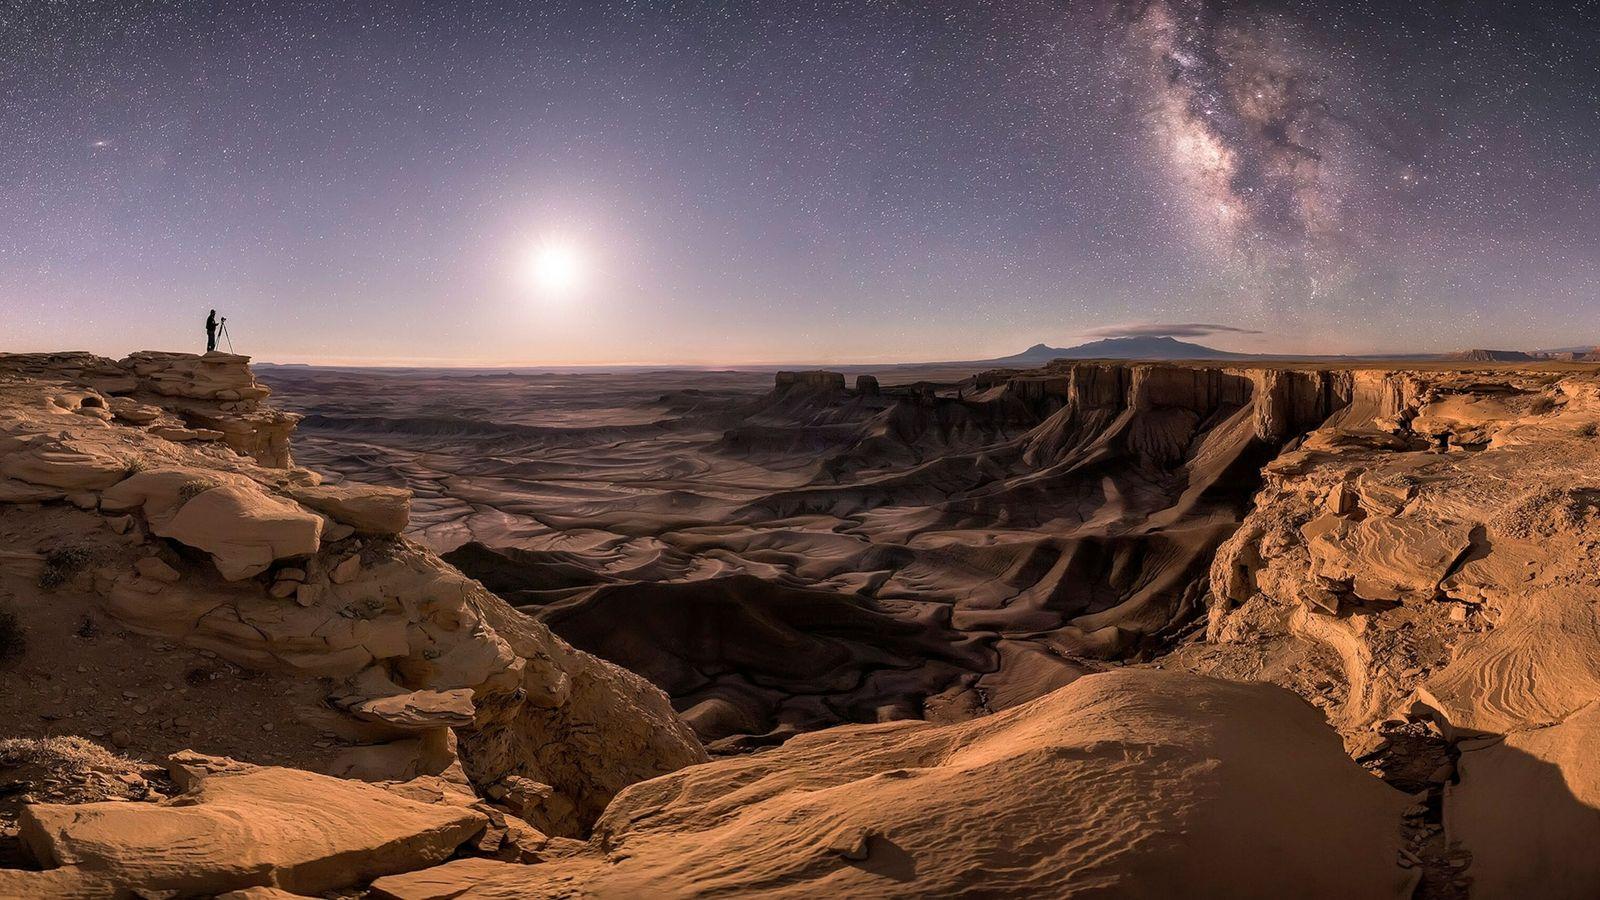 01_astronomy_photo_winners_transport-the-soul-brad-goldpaint